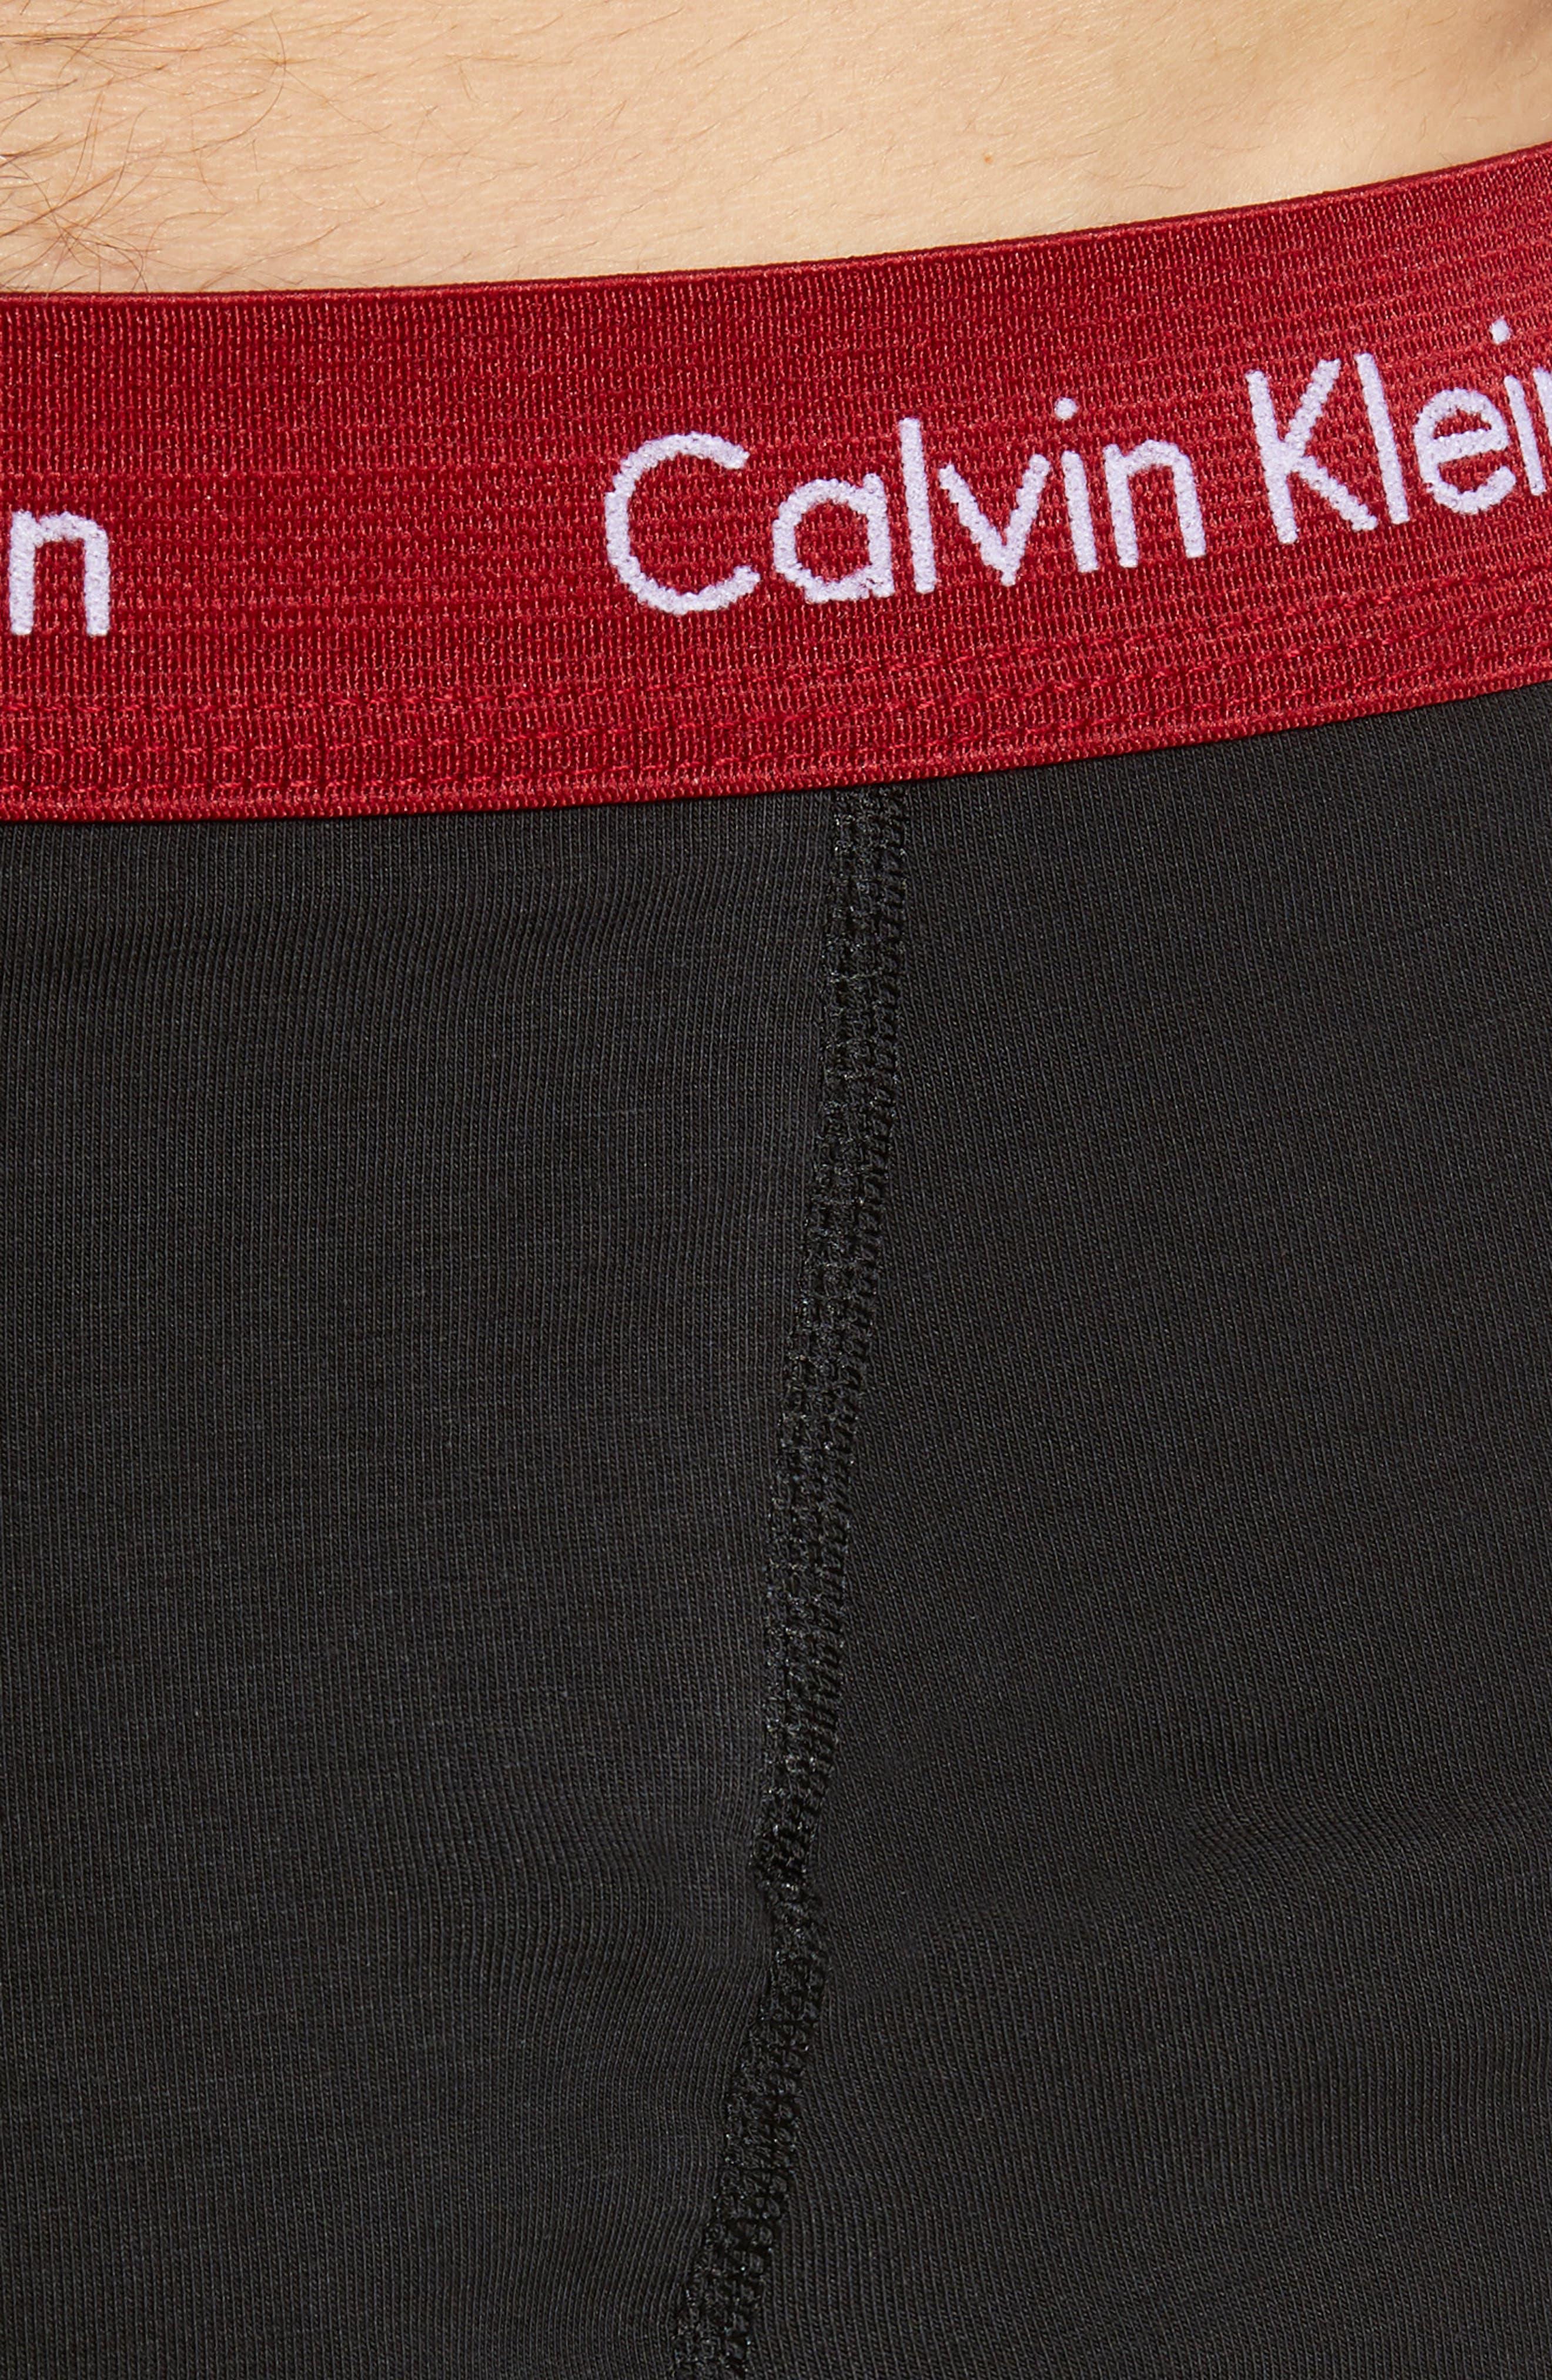 4-Pack Cotton Blend Boxer Briefs,                             Alternate thumbnail 5, color,                             BLACK/ RED MULTI/ GREY SKY